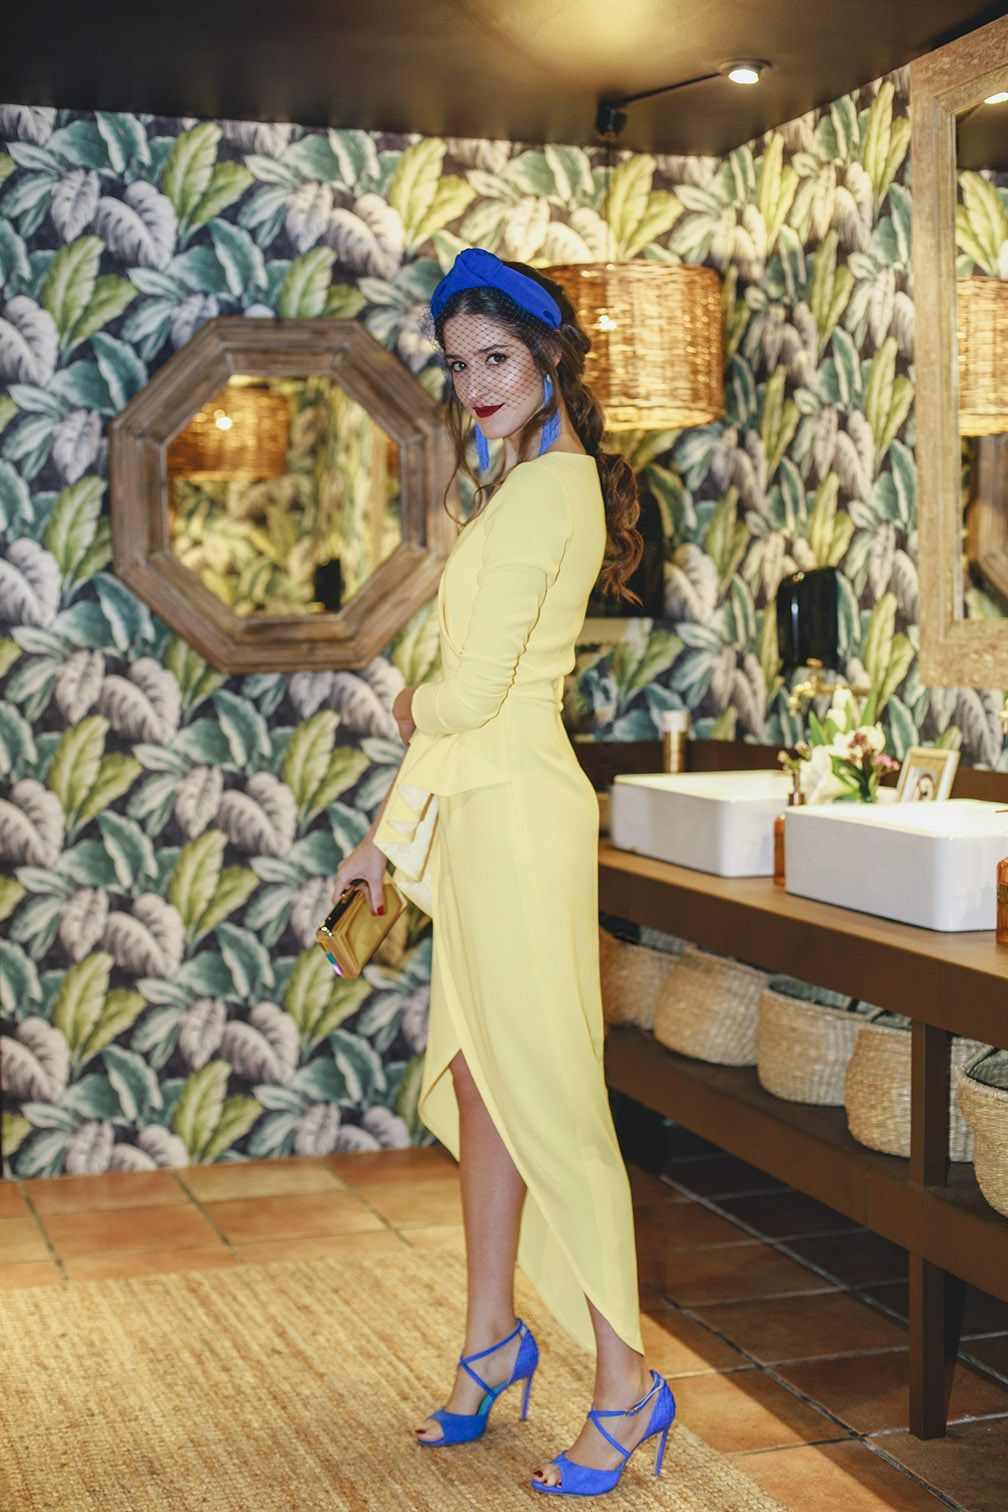 5c2082c3b Mejor look invitada boda mañana vestido amarillo complementos azul klein  tocado